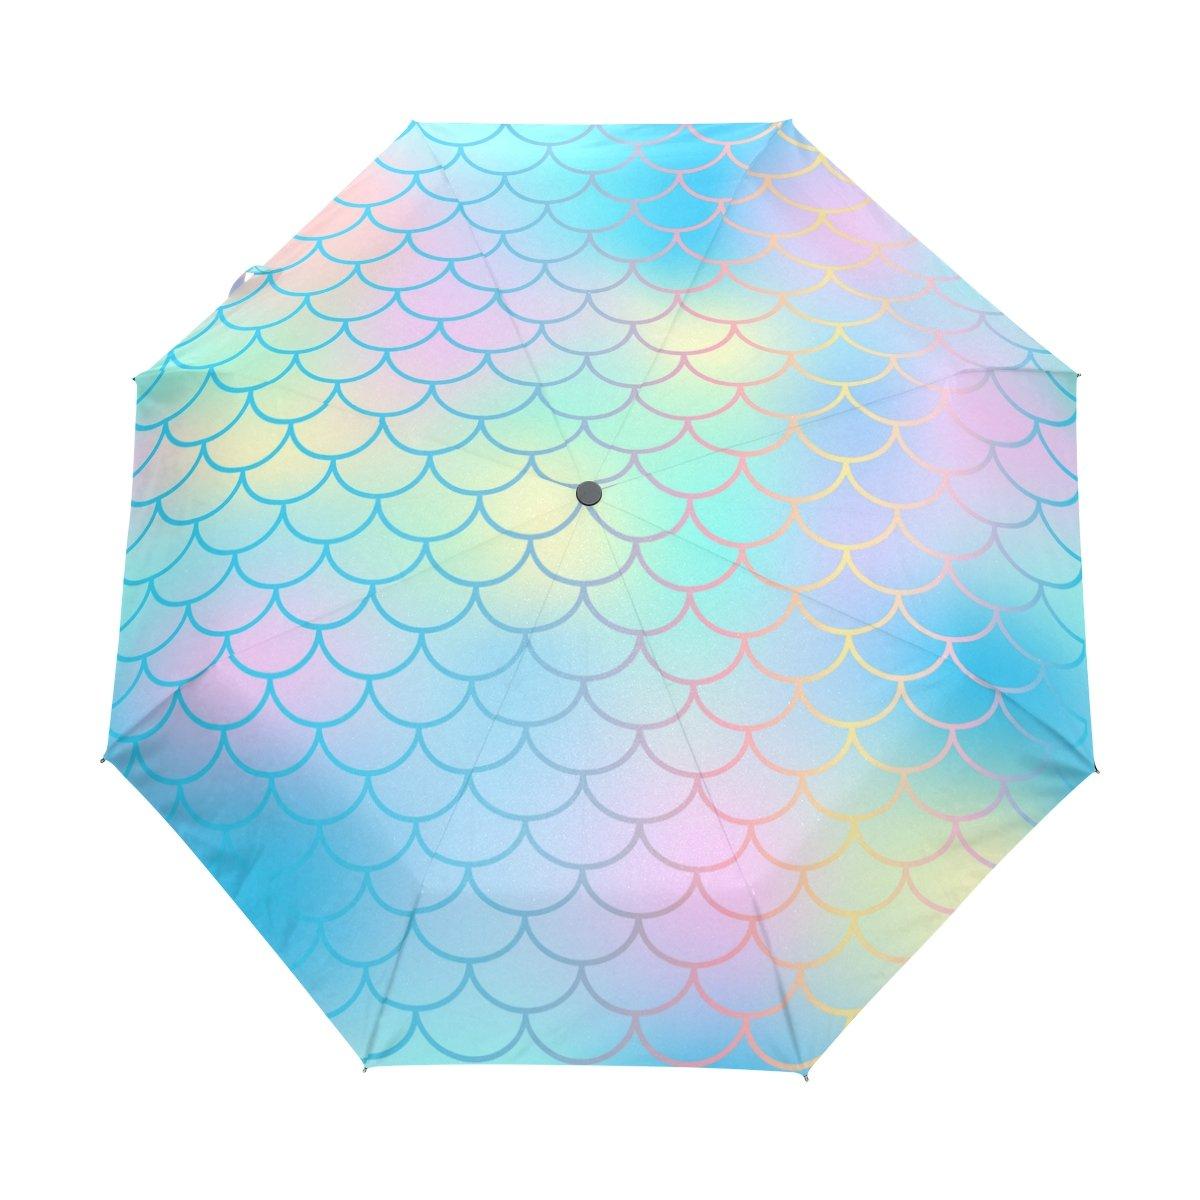 Colorful Umbrellas Printed Canvas Duffle Luggage Travel Bag WAS/_42